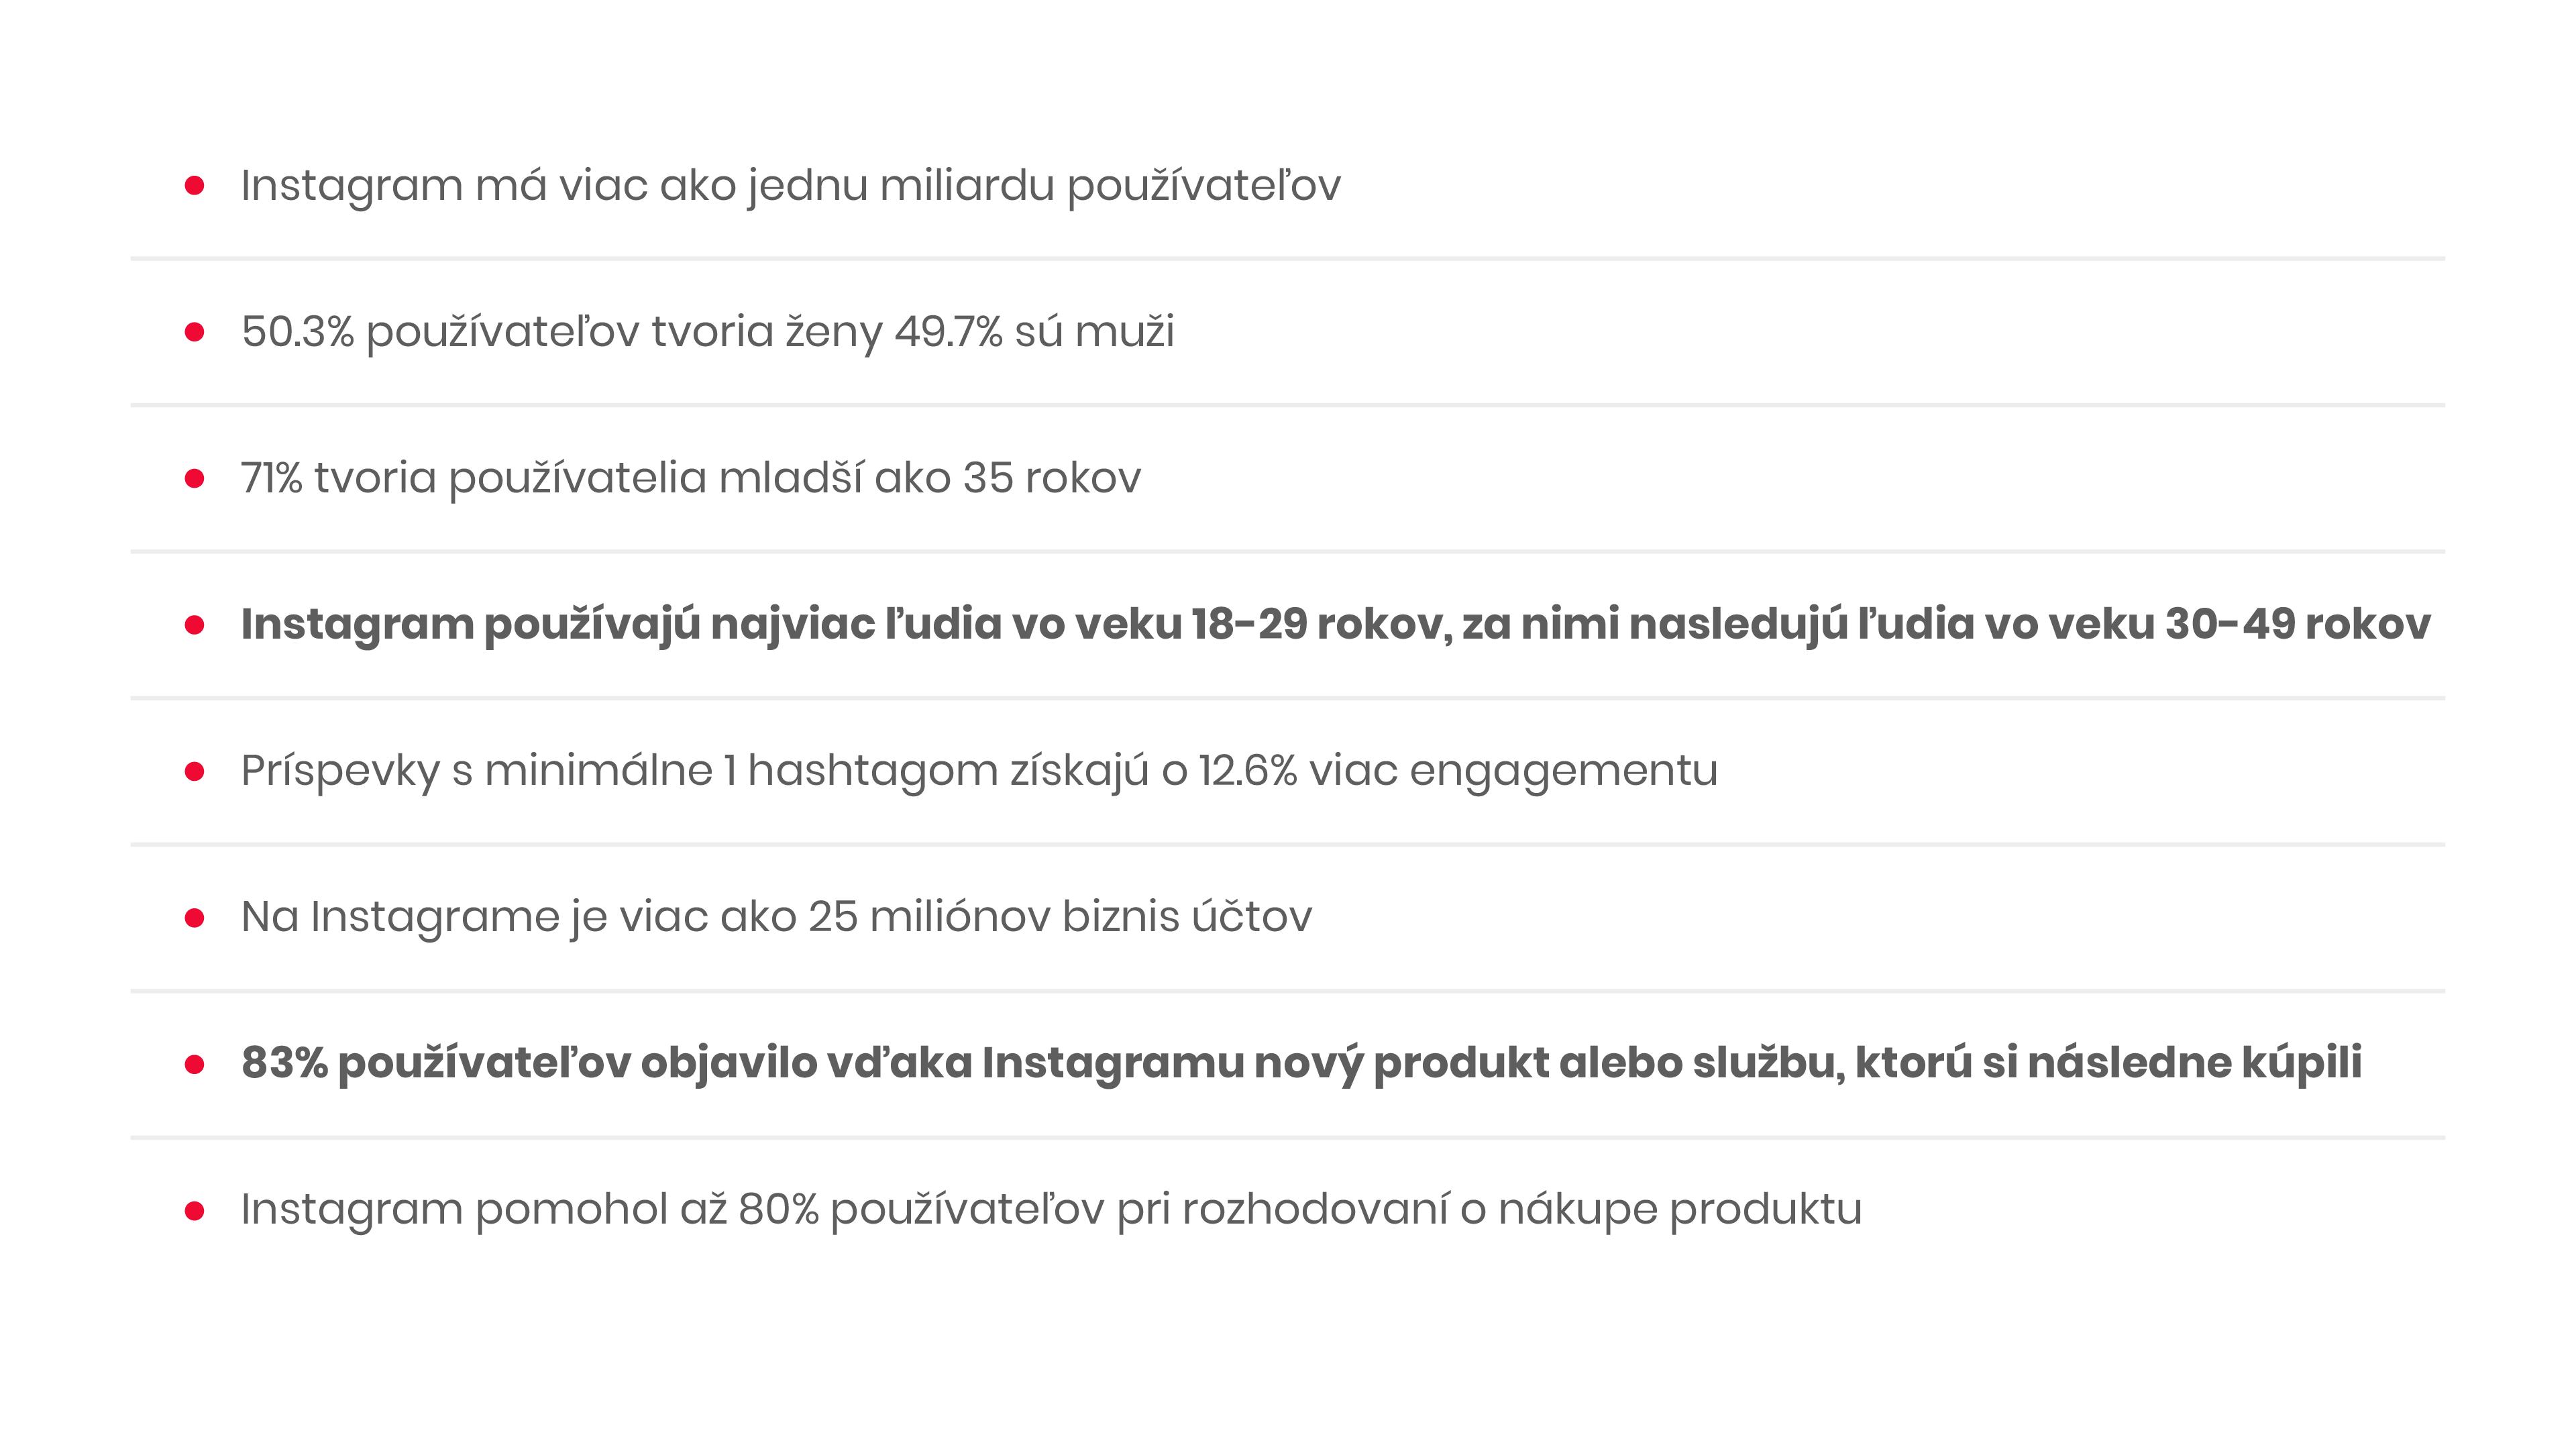 statistika-pouzivatelia-social-media-instagram-upvision